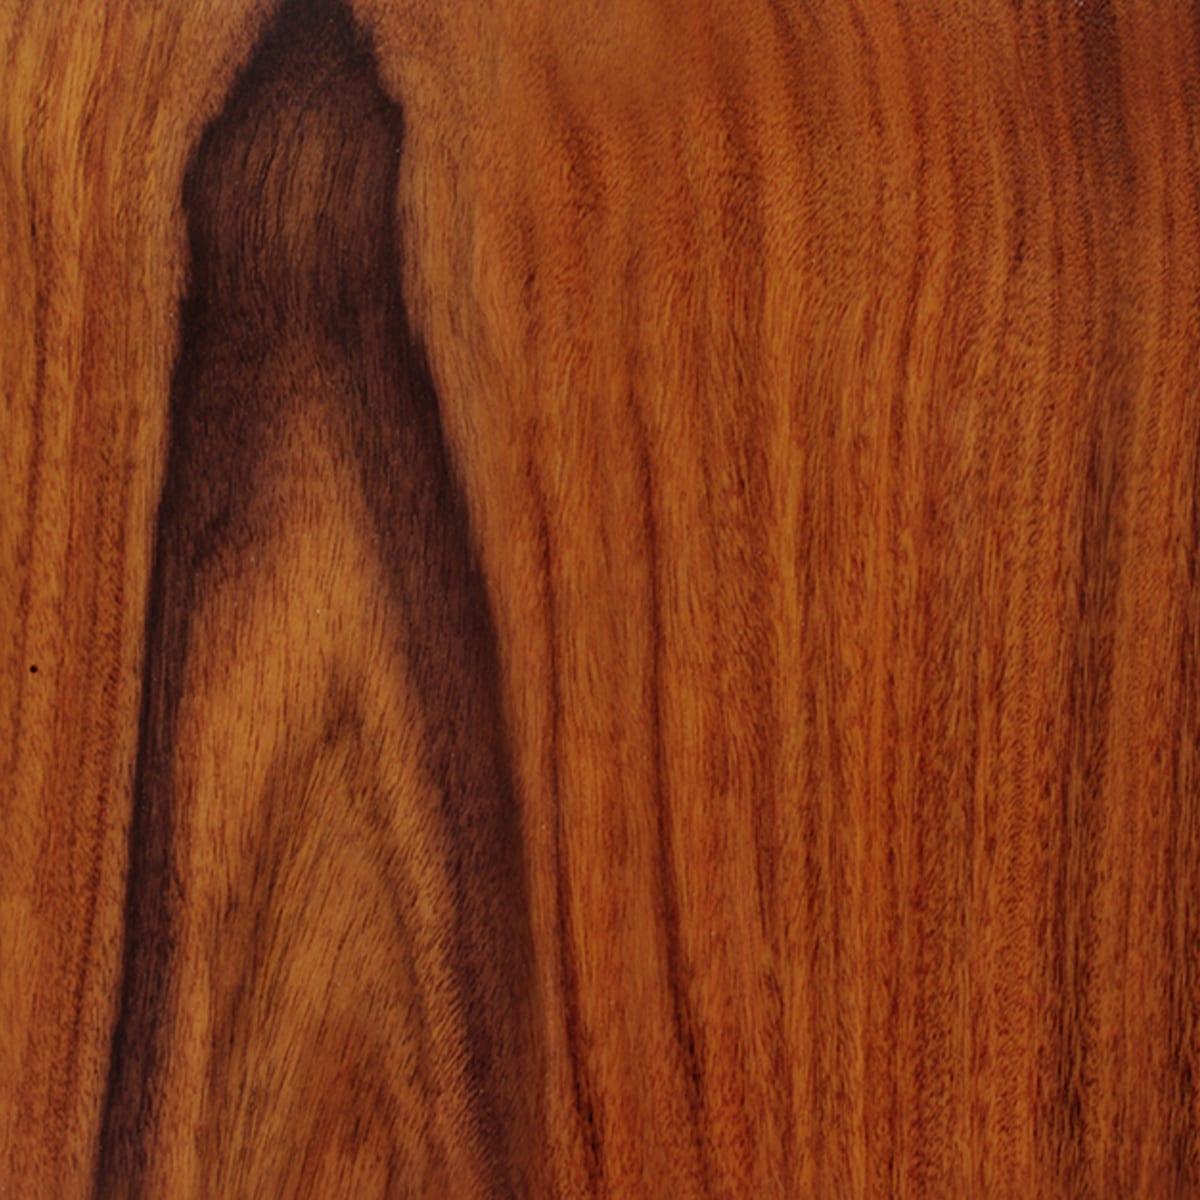 iron wood - wood veneer